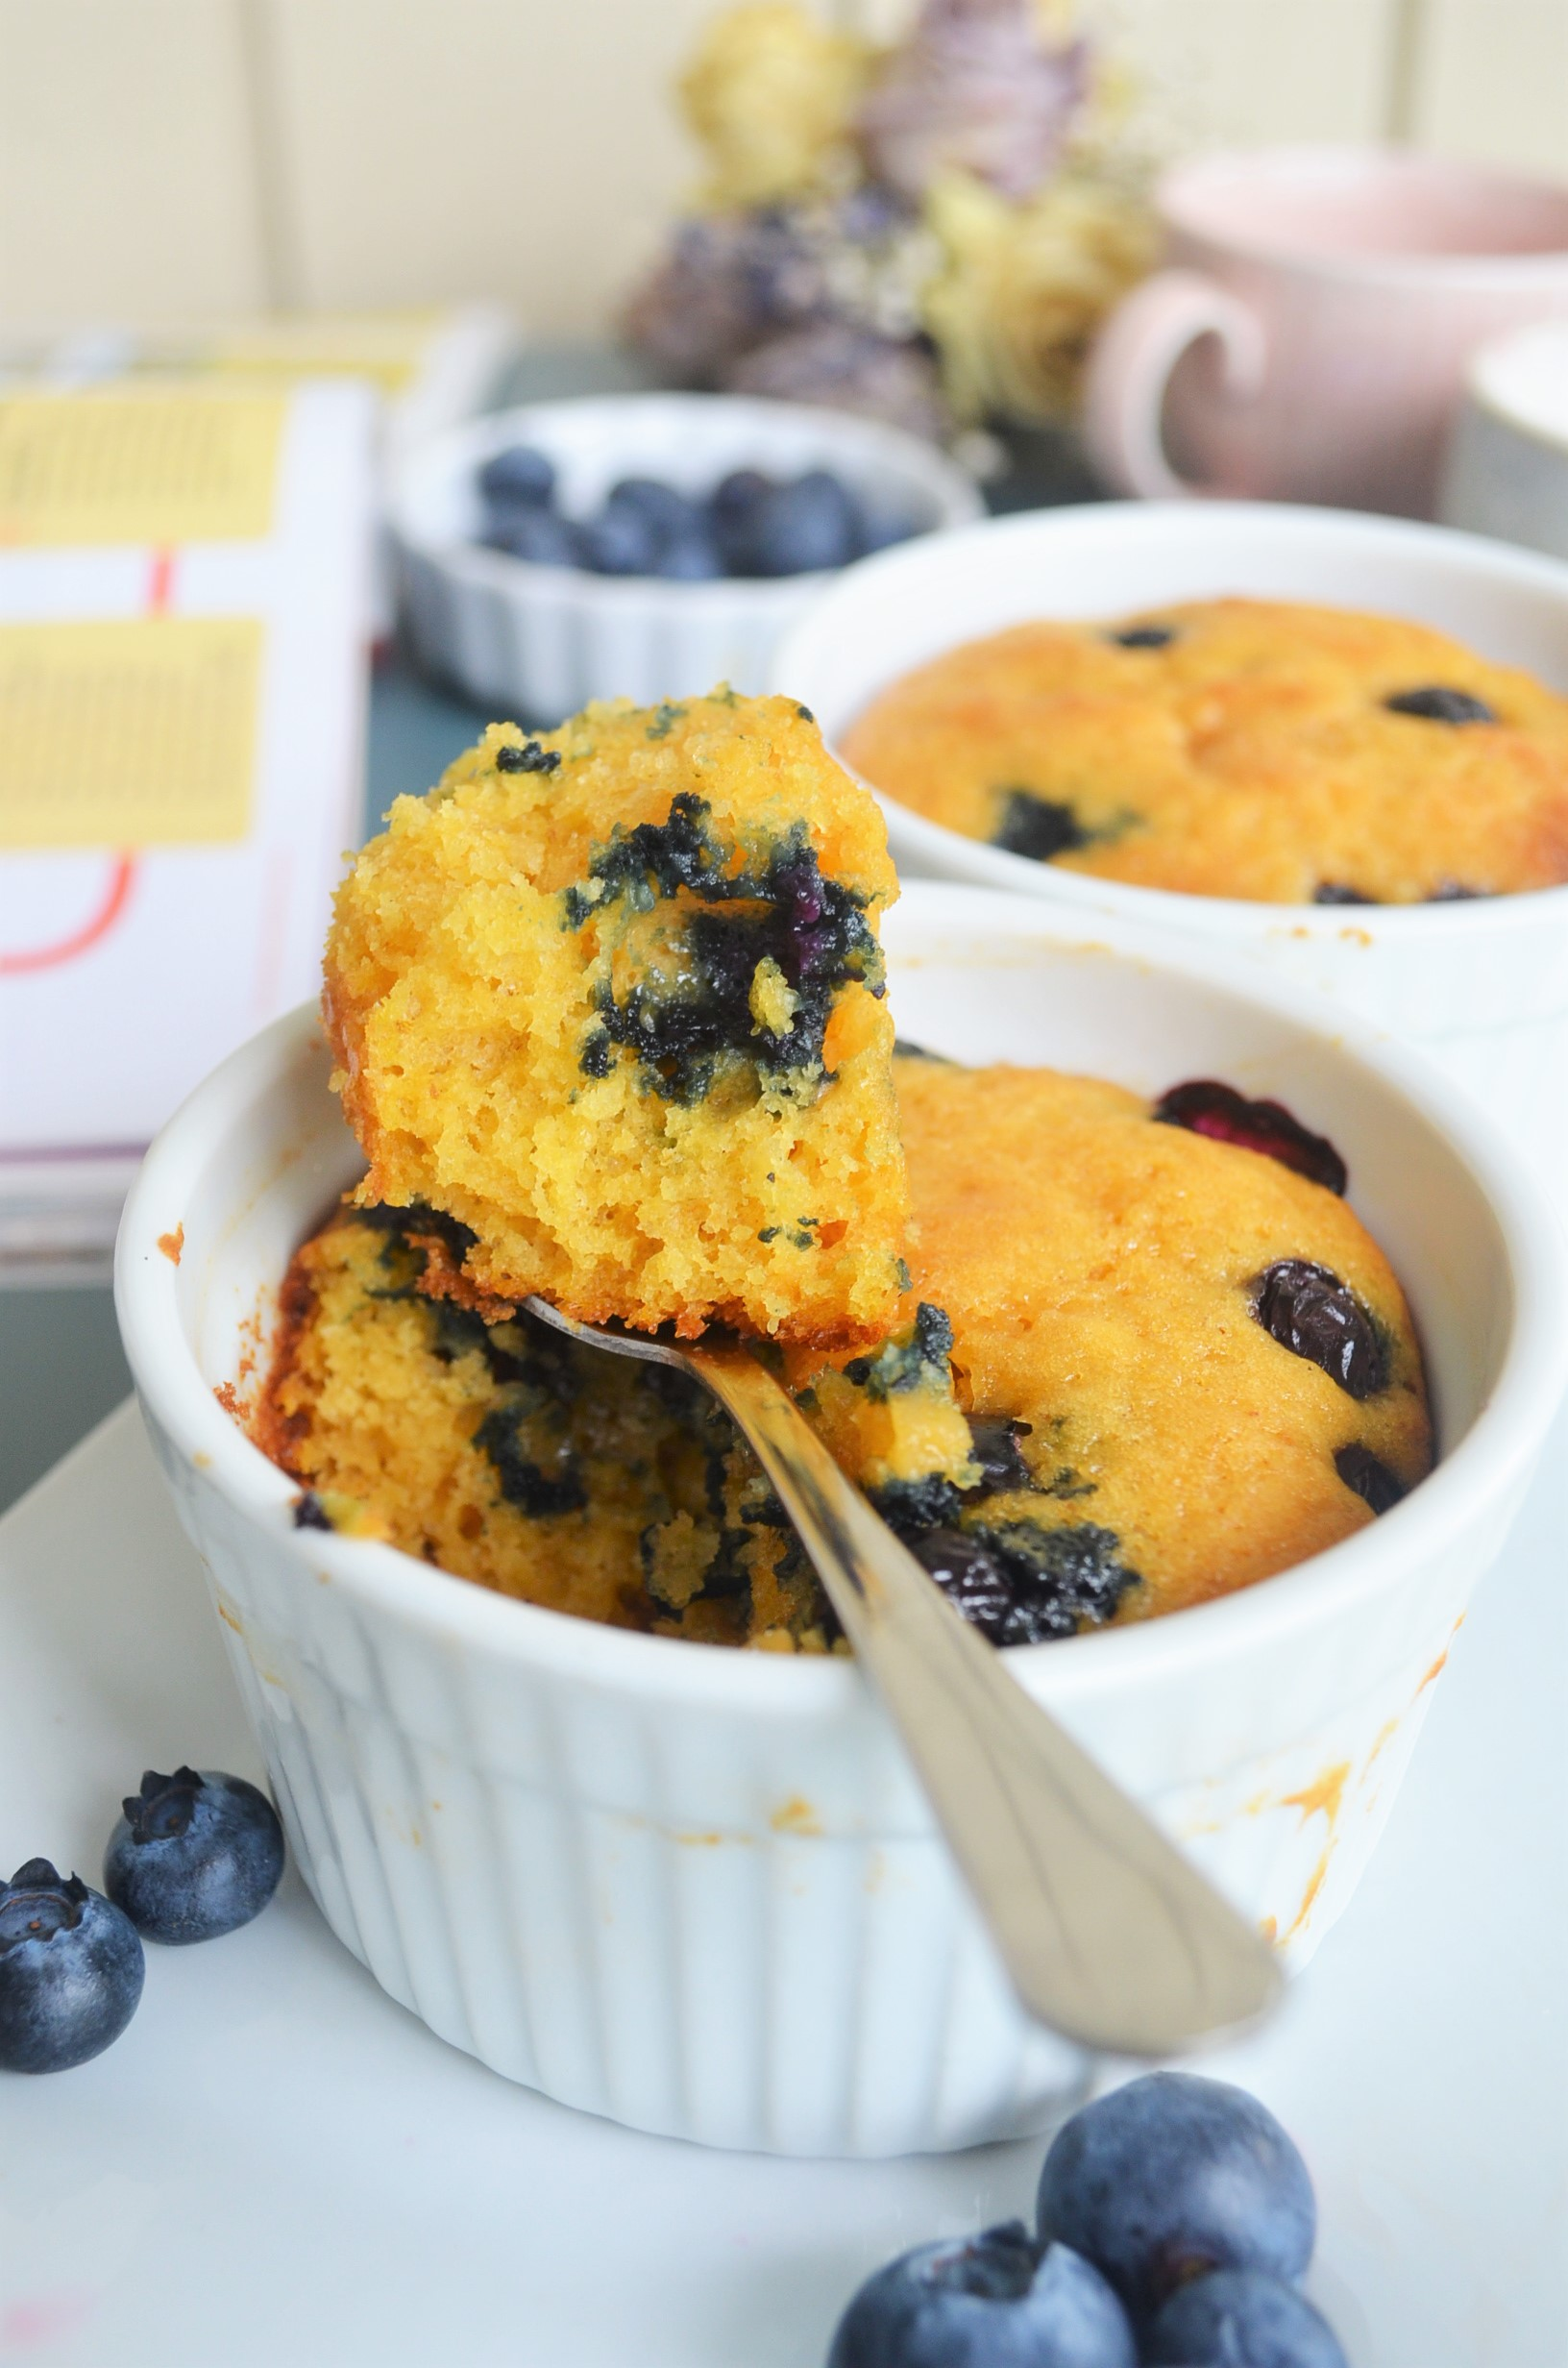 Small Batch Blueberry Pumpkin Muffin in Ramekin